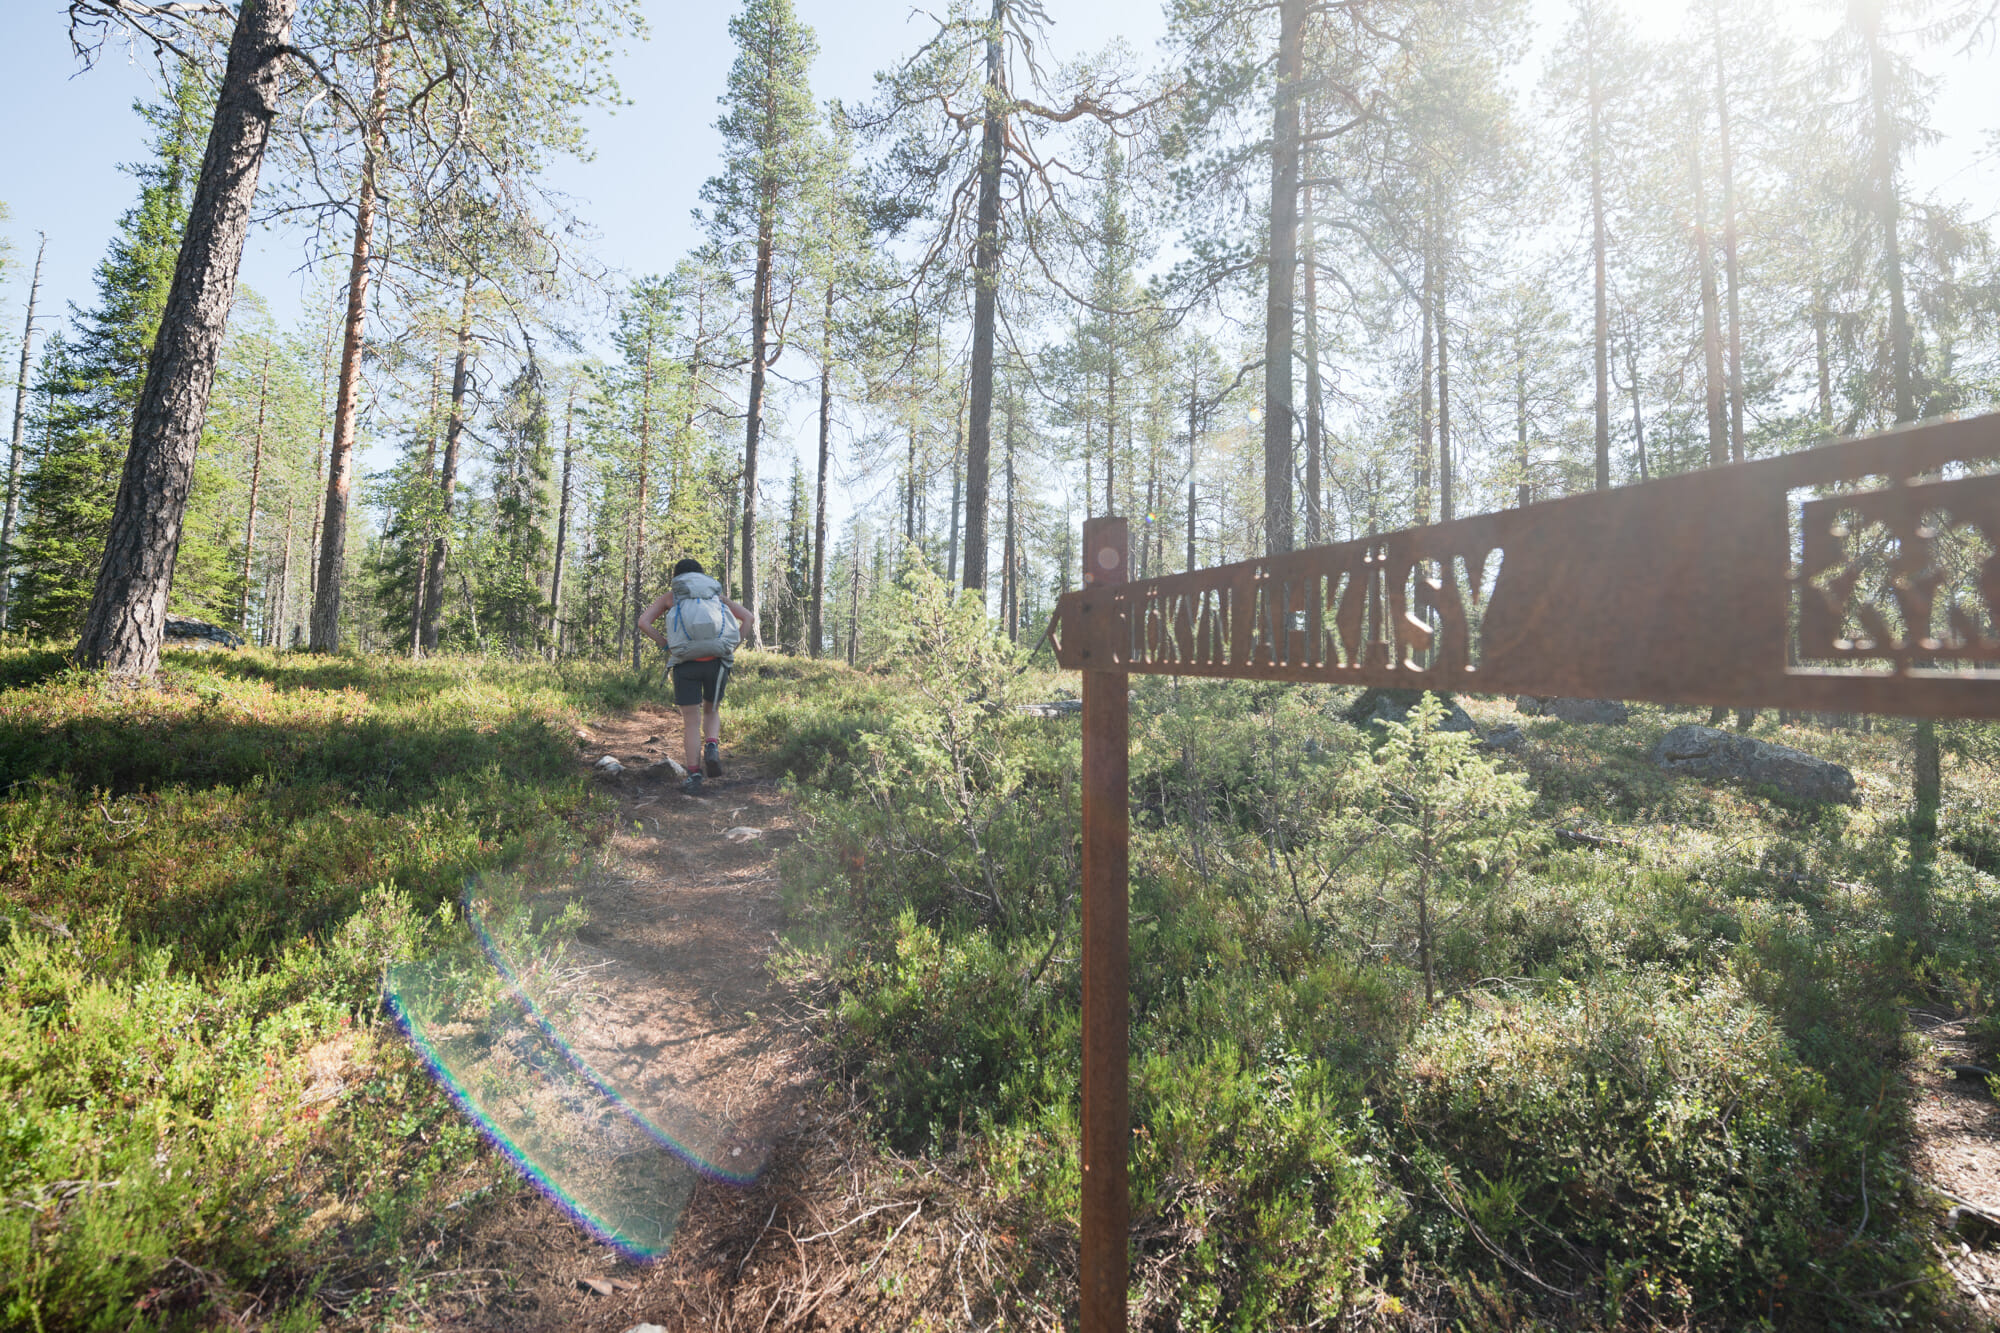 Une des deux randonnées à Hossa : Ölökyn Ähkäsy